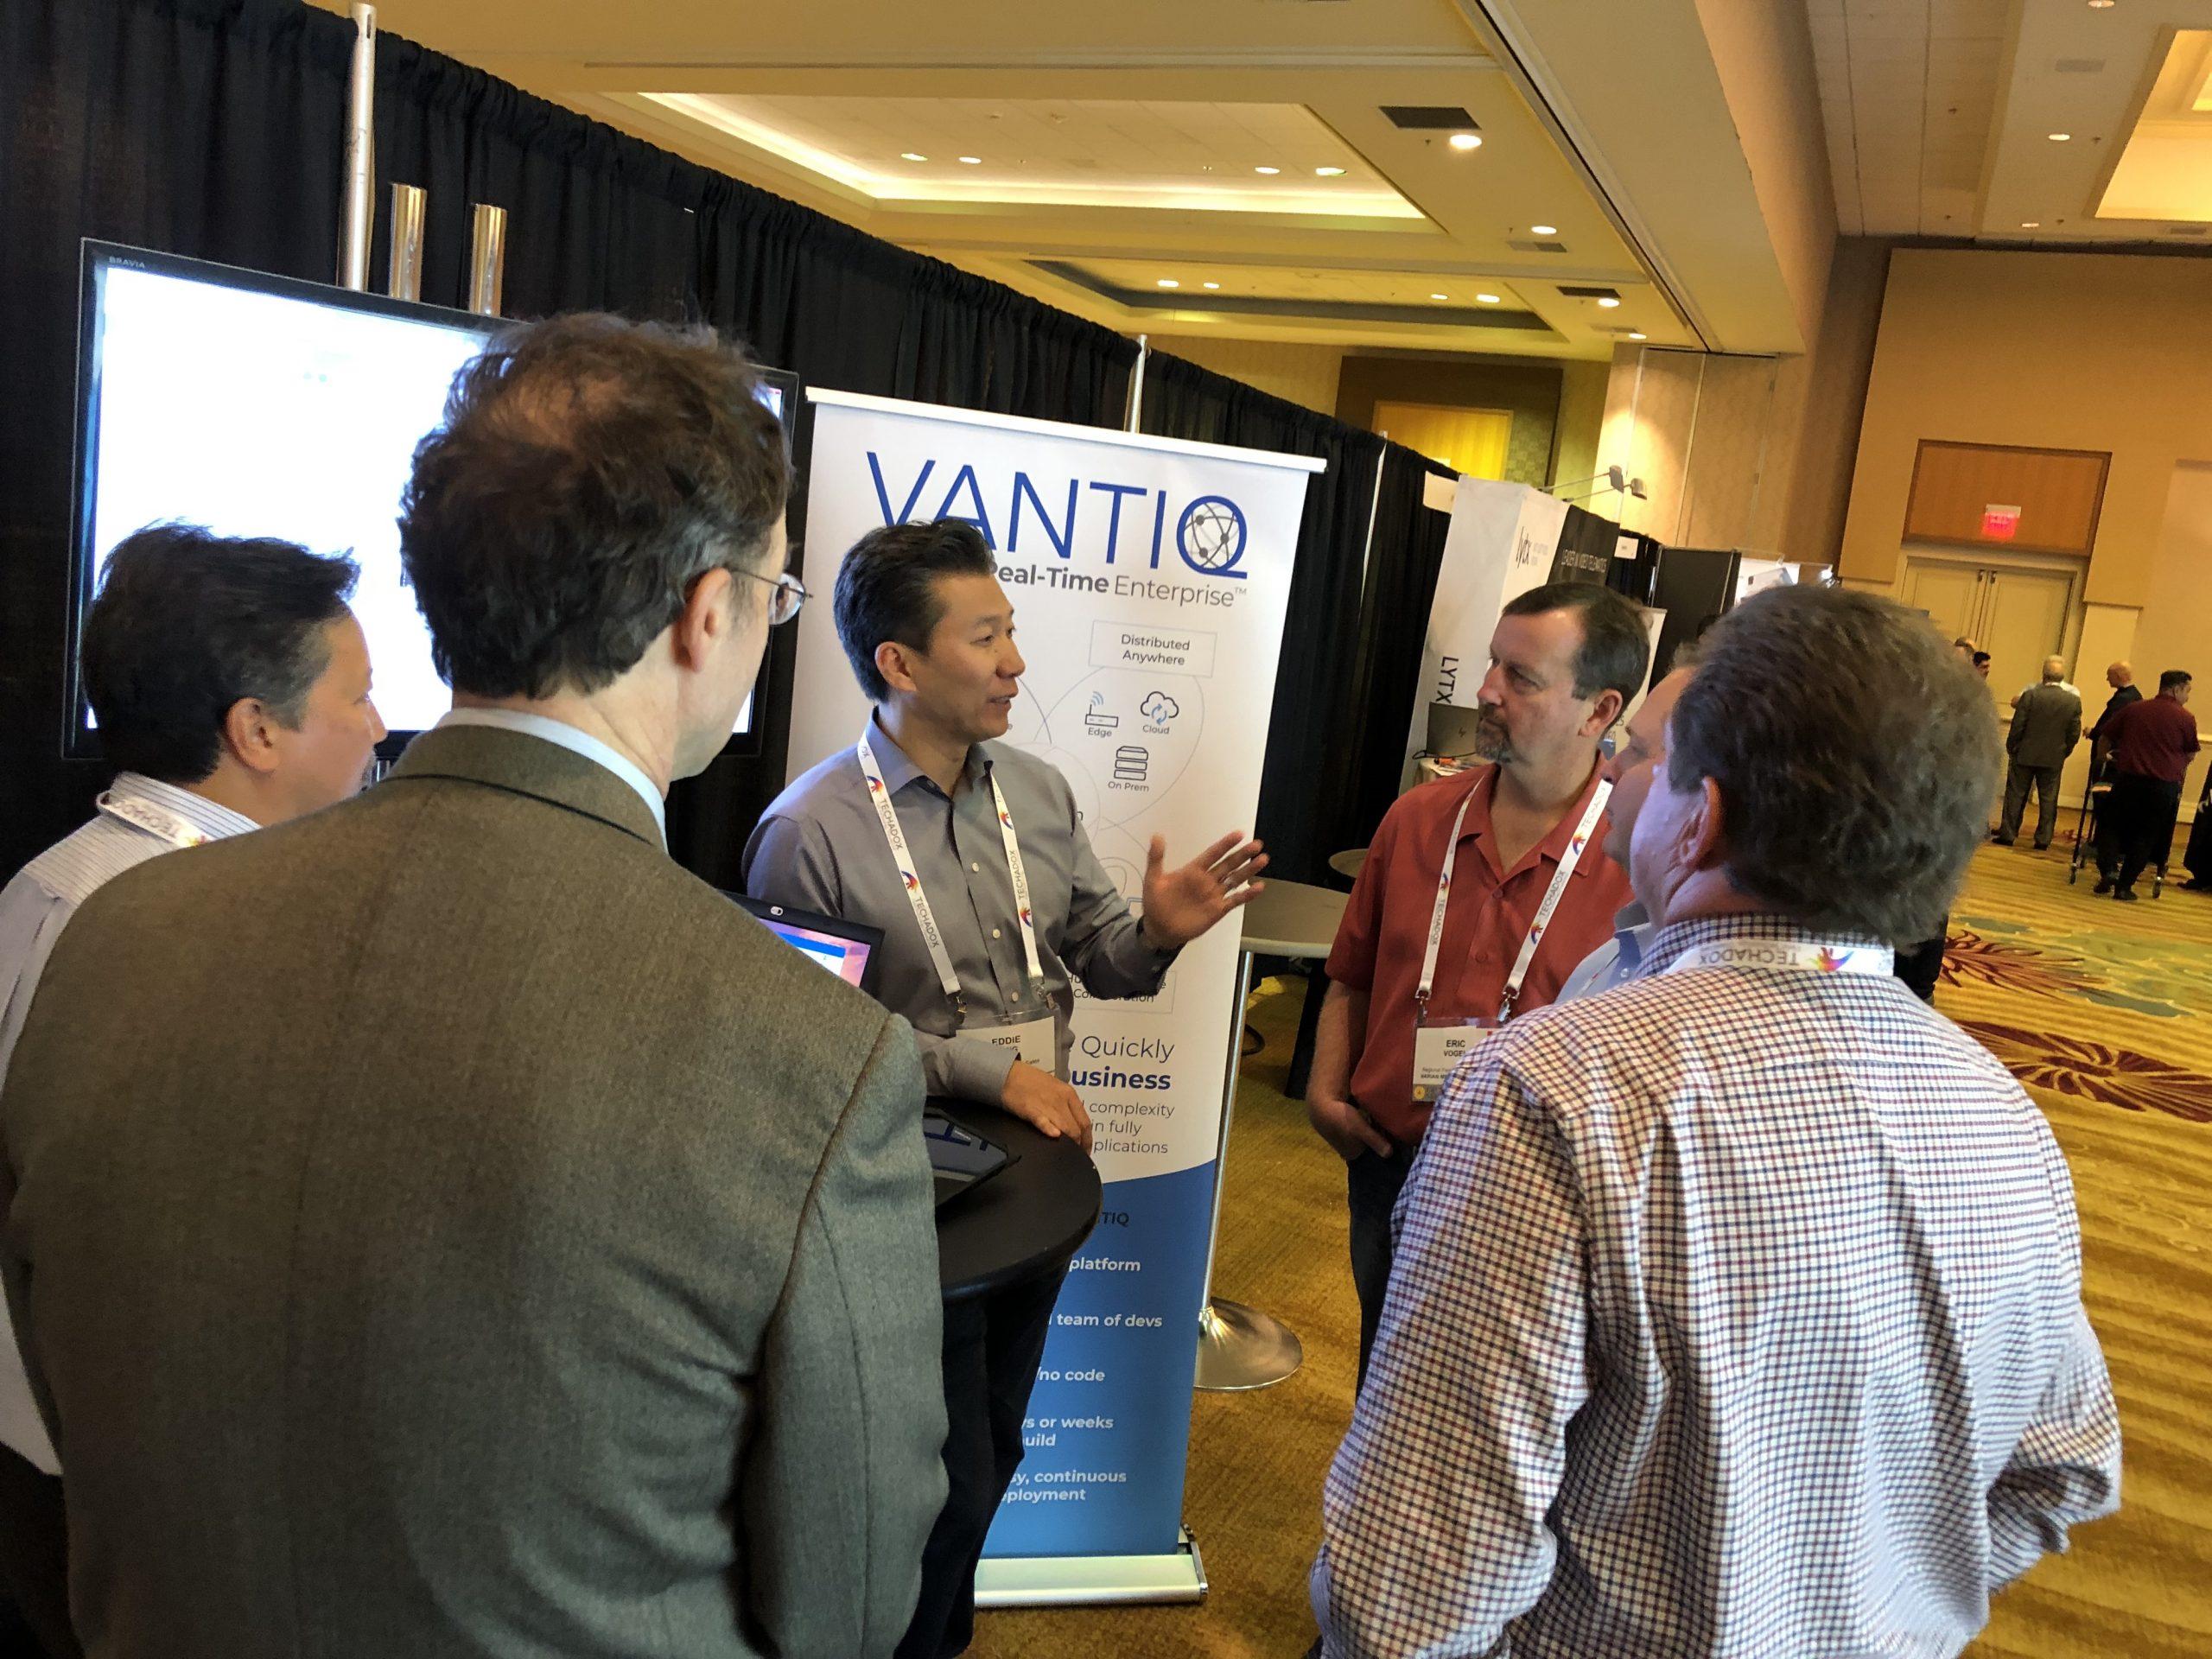 Eddie Tung, Mark Silva and Robert Biczek talking to other participants at VANTIQ booth